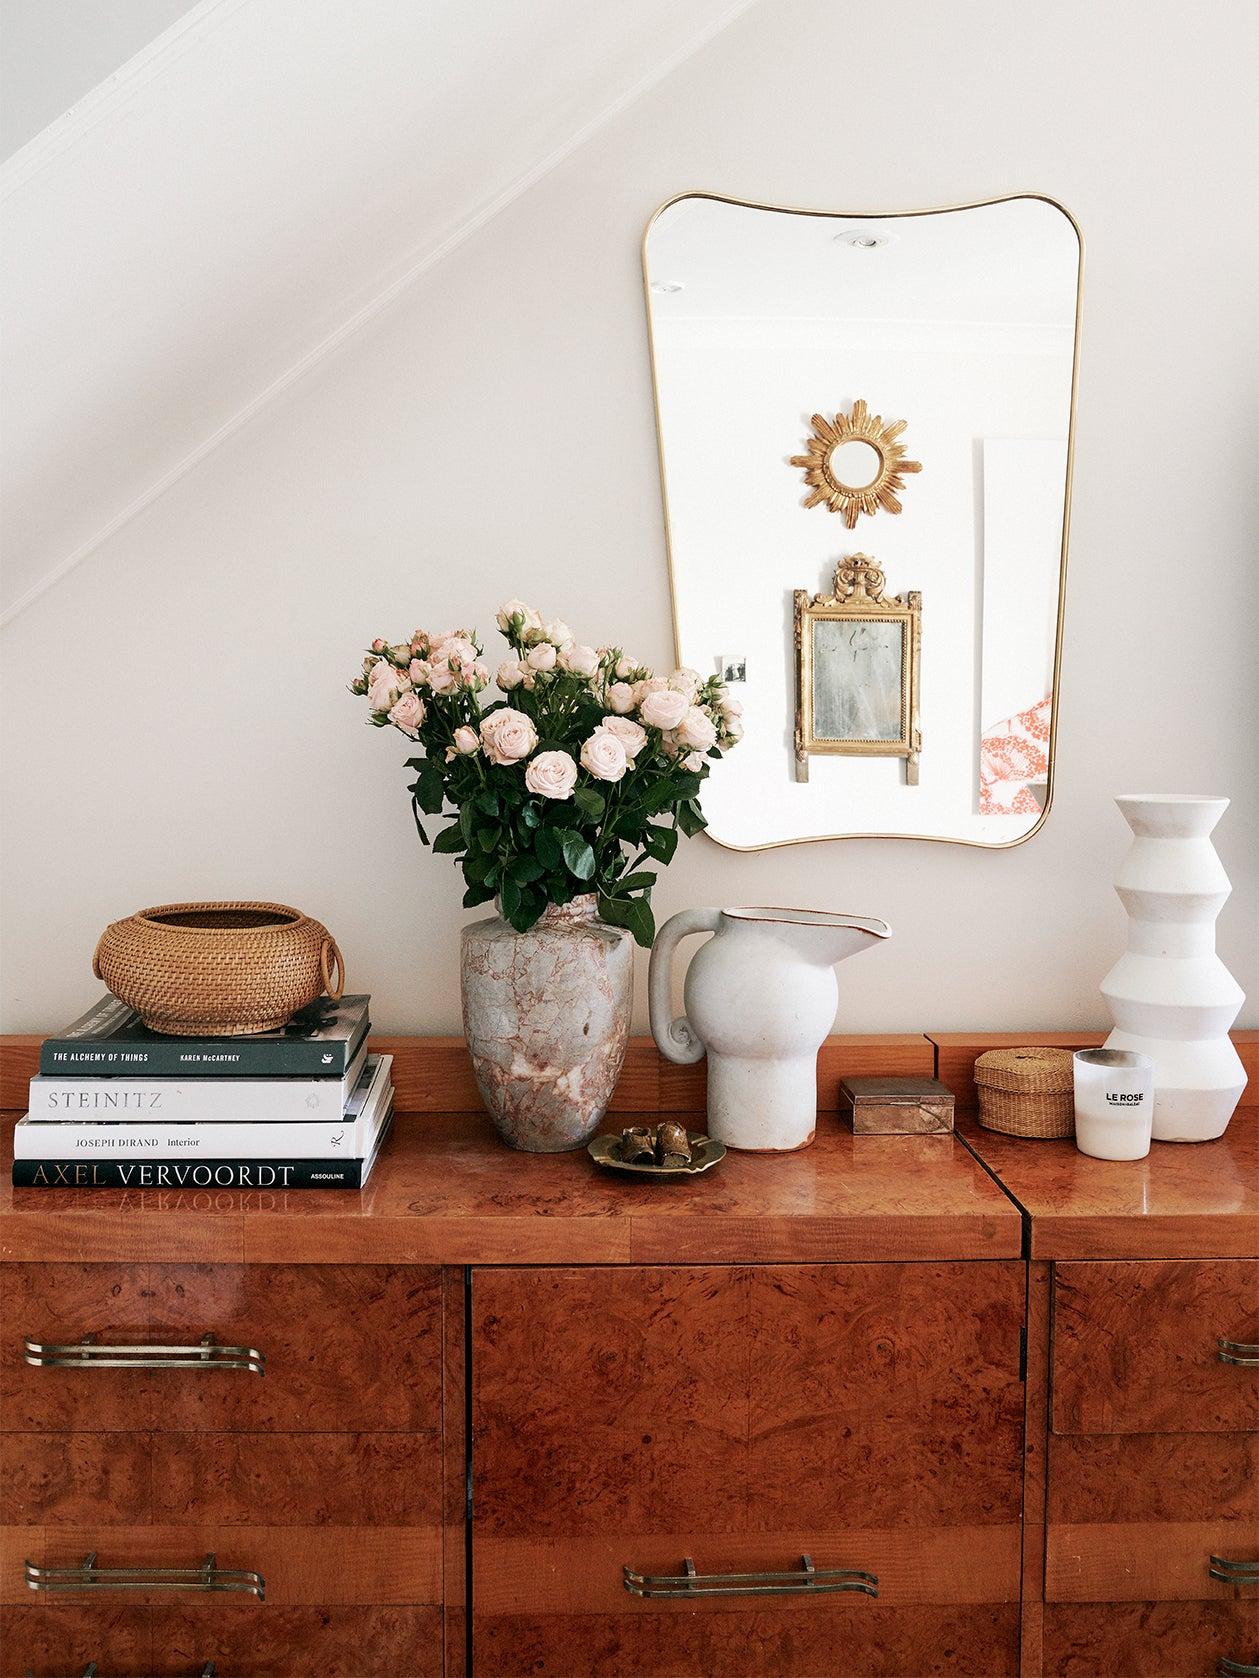 Dresser with vases.